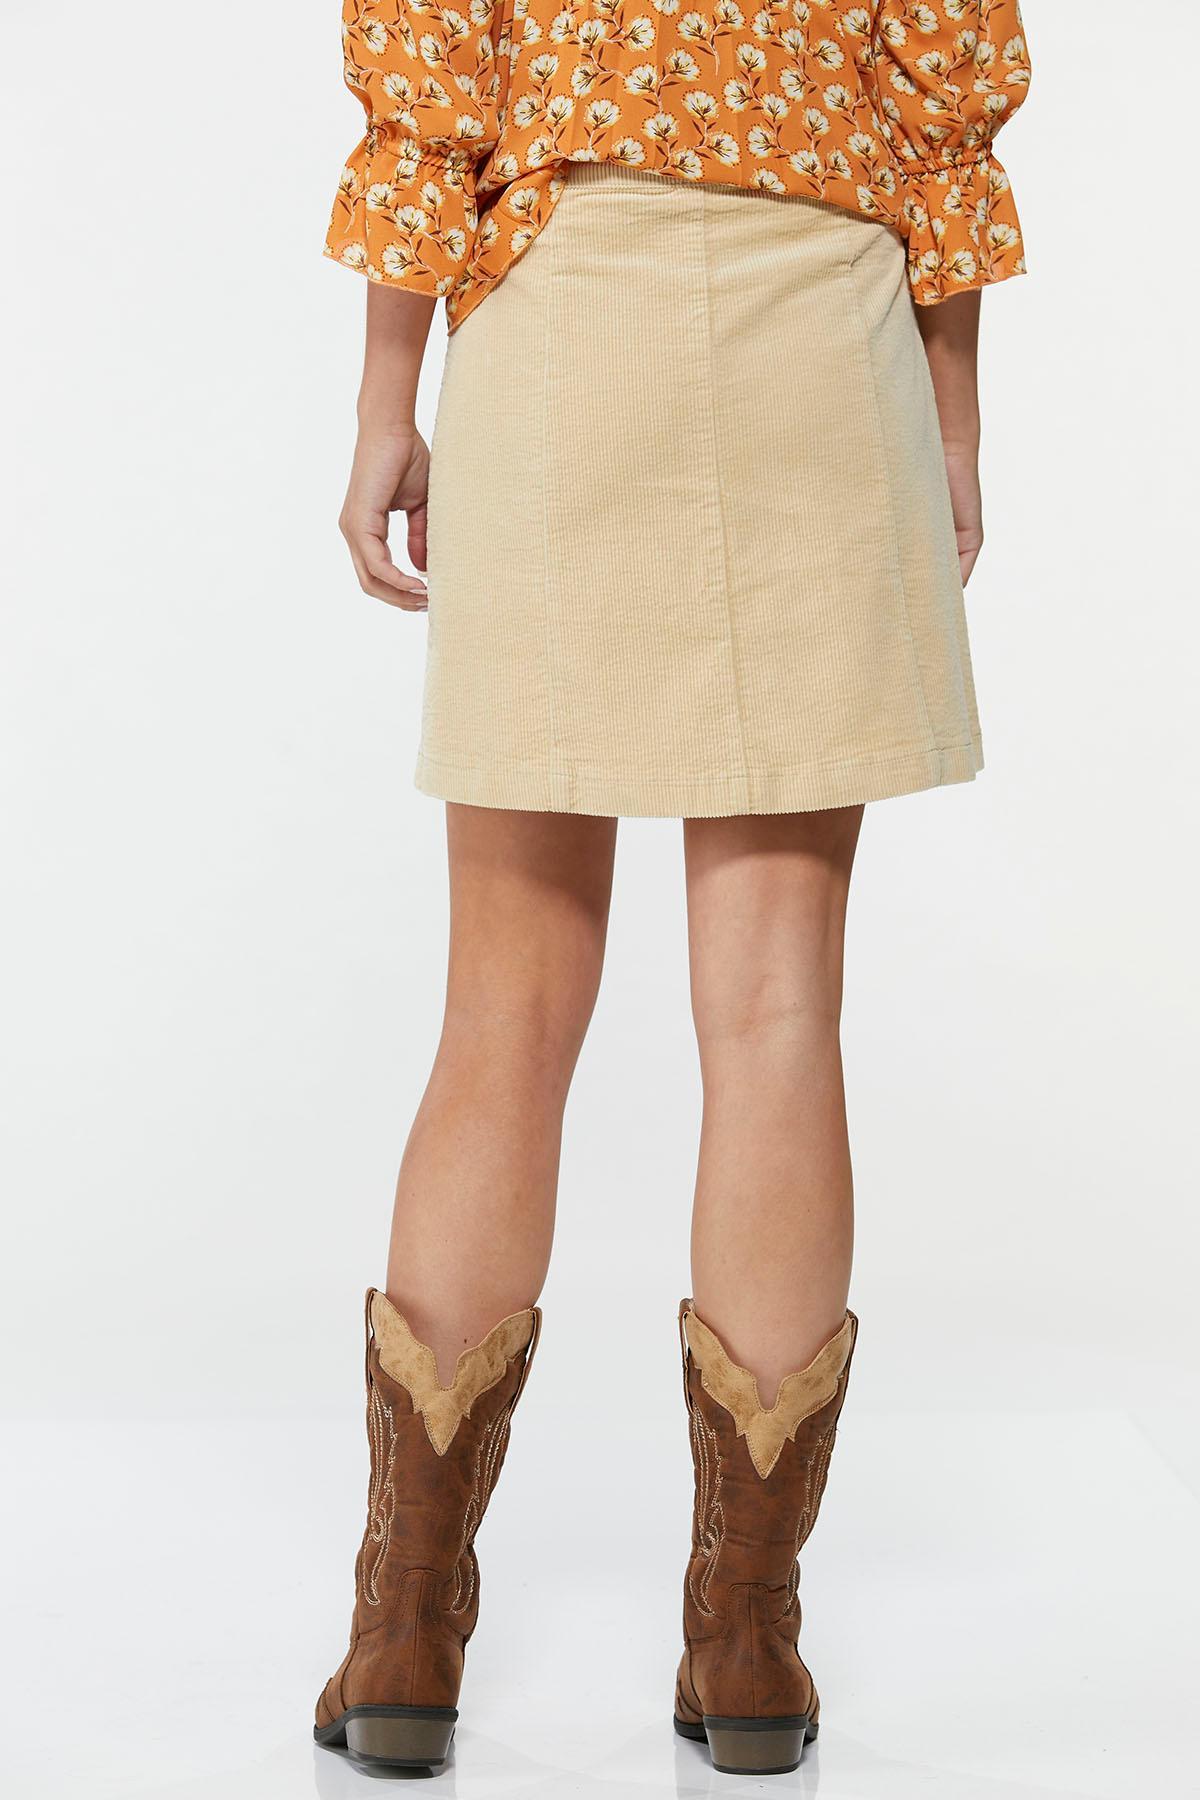 Khaki Corduroy Skirt (Item #44667056)